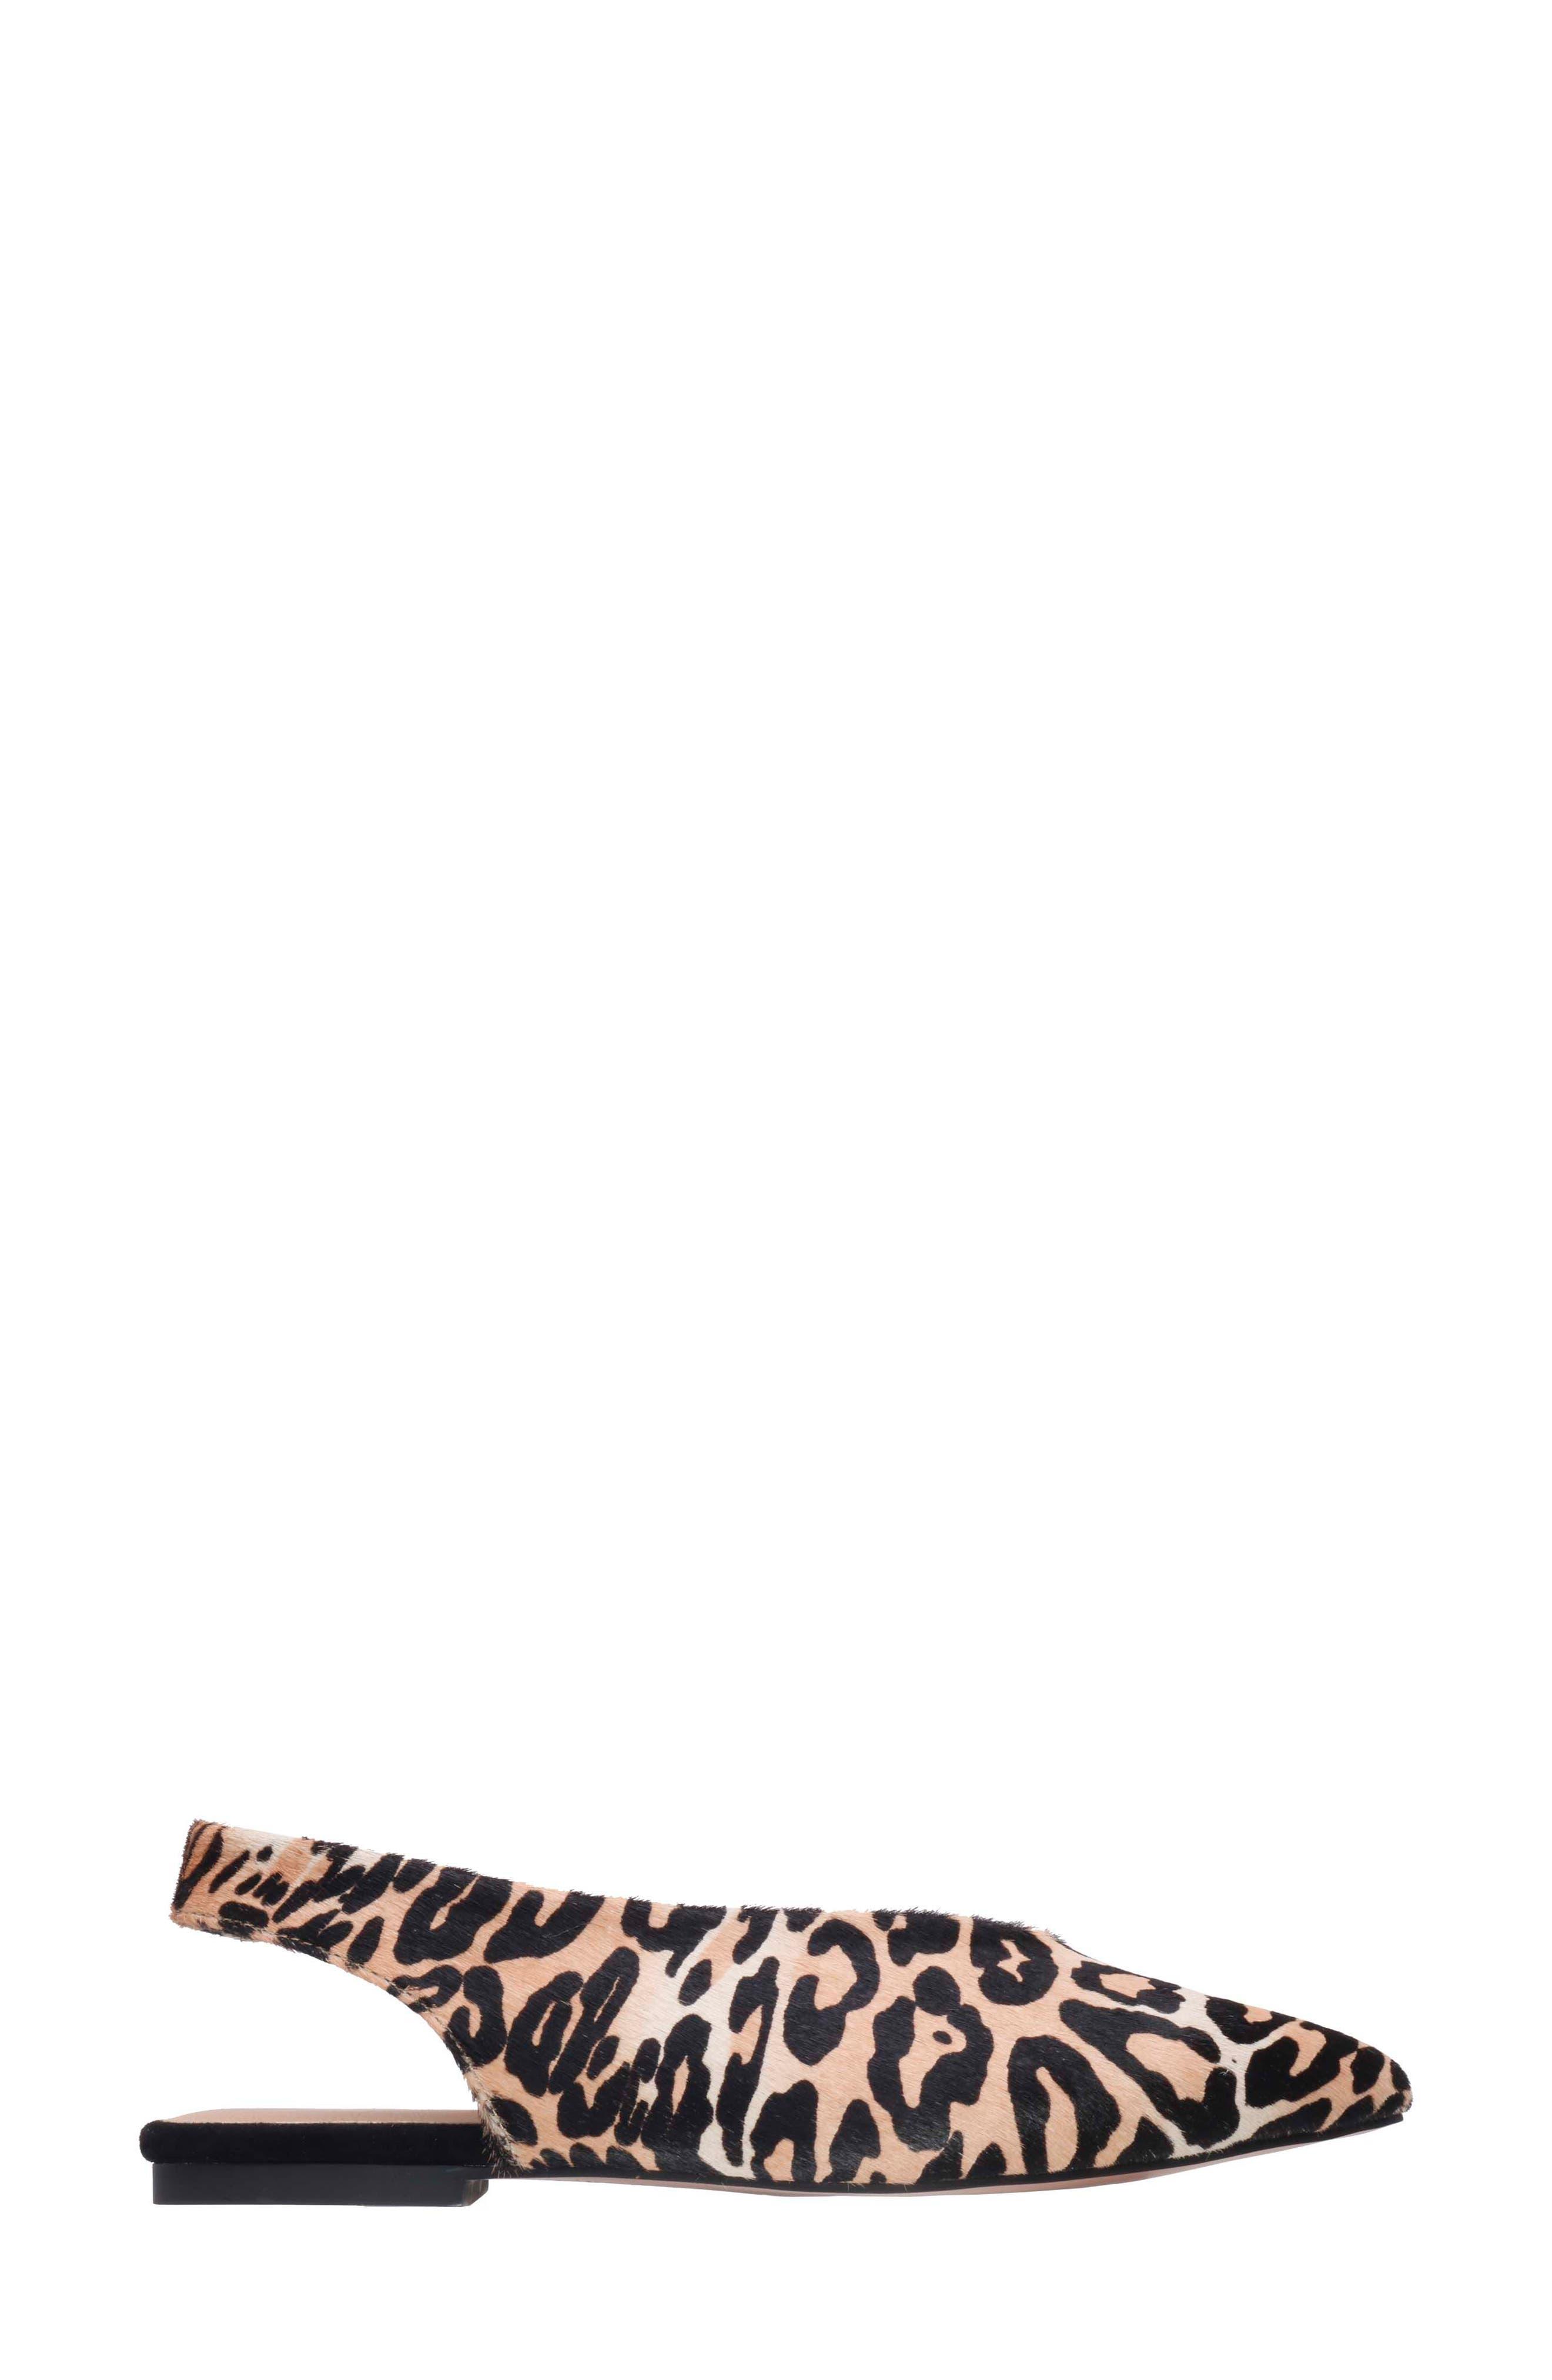 Violet Genuine Calf Hair Slingback Flat,                             Alternate thumbnail 3, color,                             Leopard Calf Hair